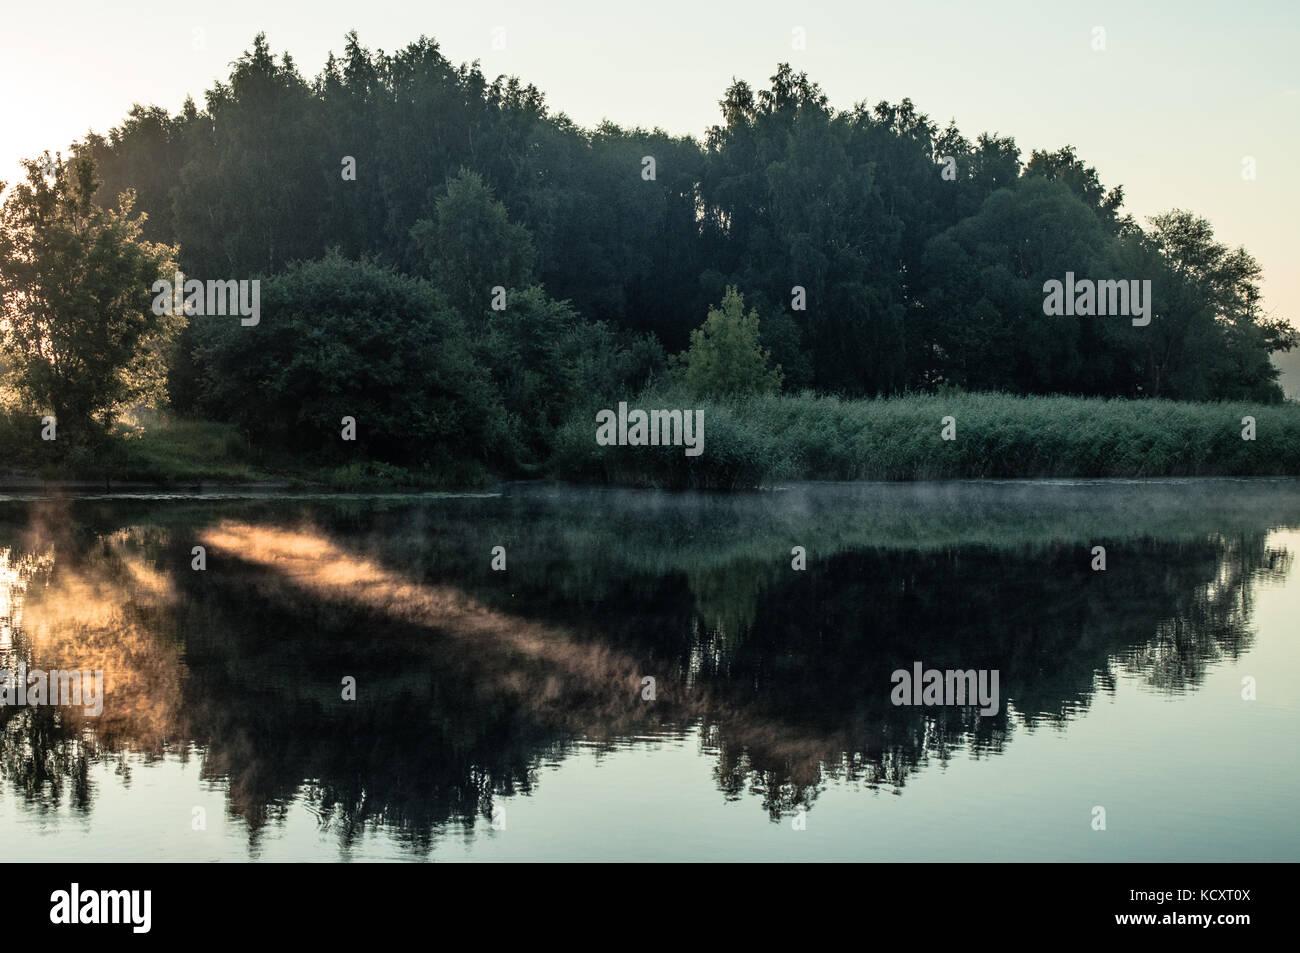 Beautiful sun rays reflection on lakes surface. - Stock Image